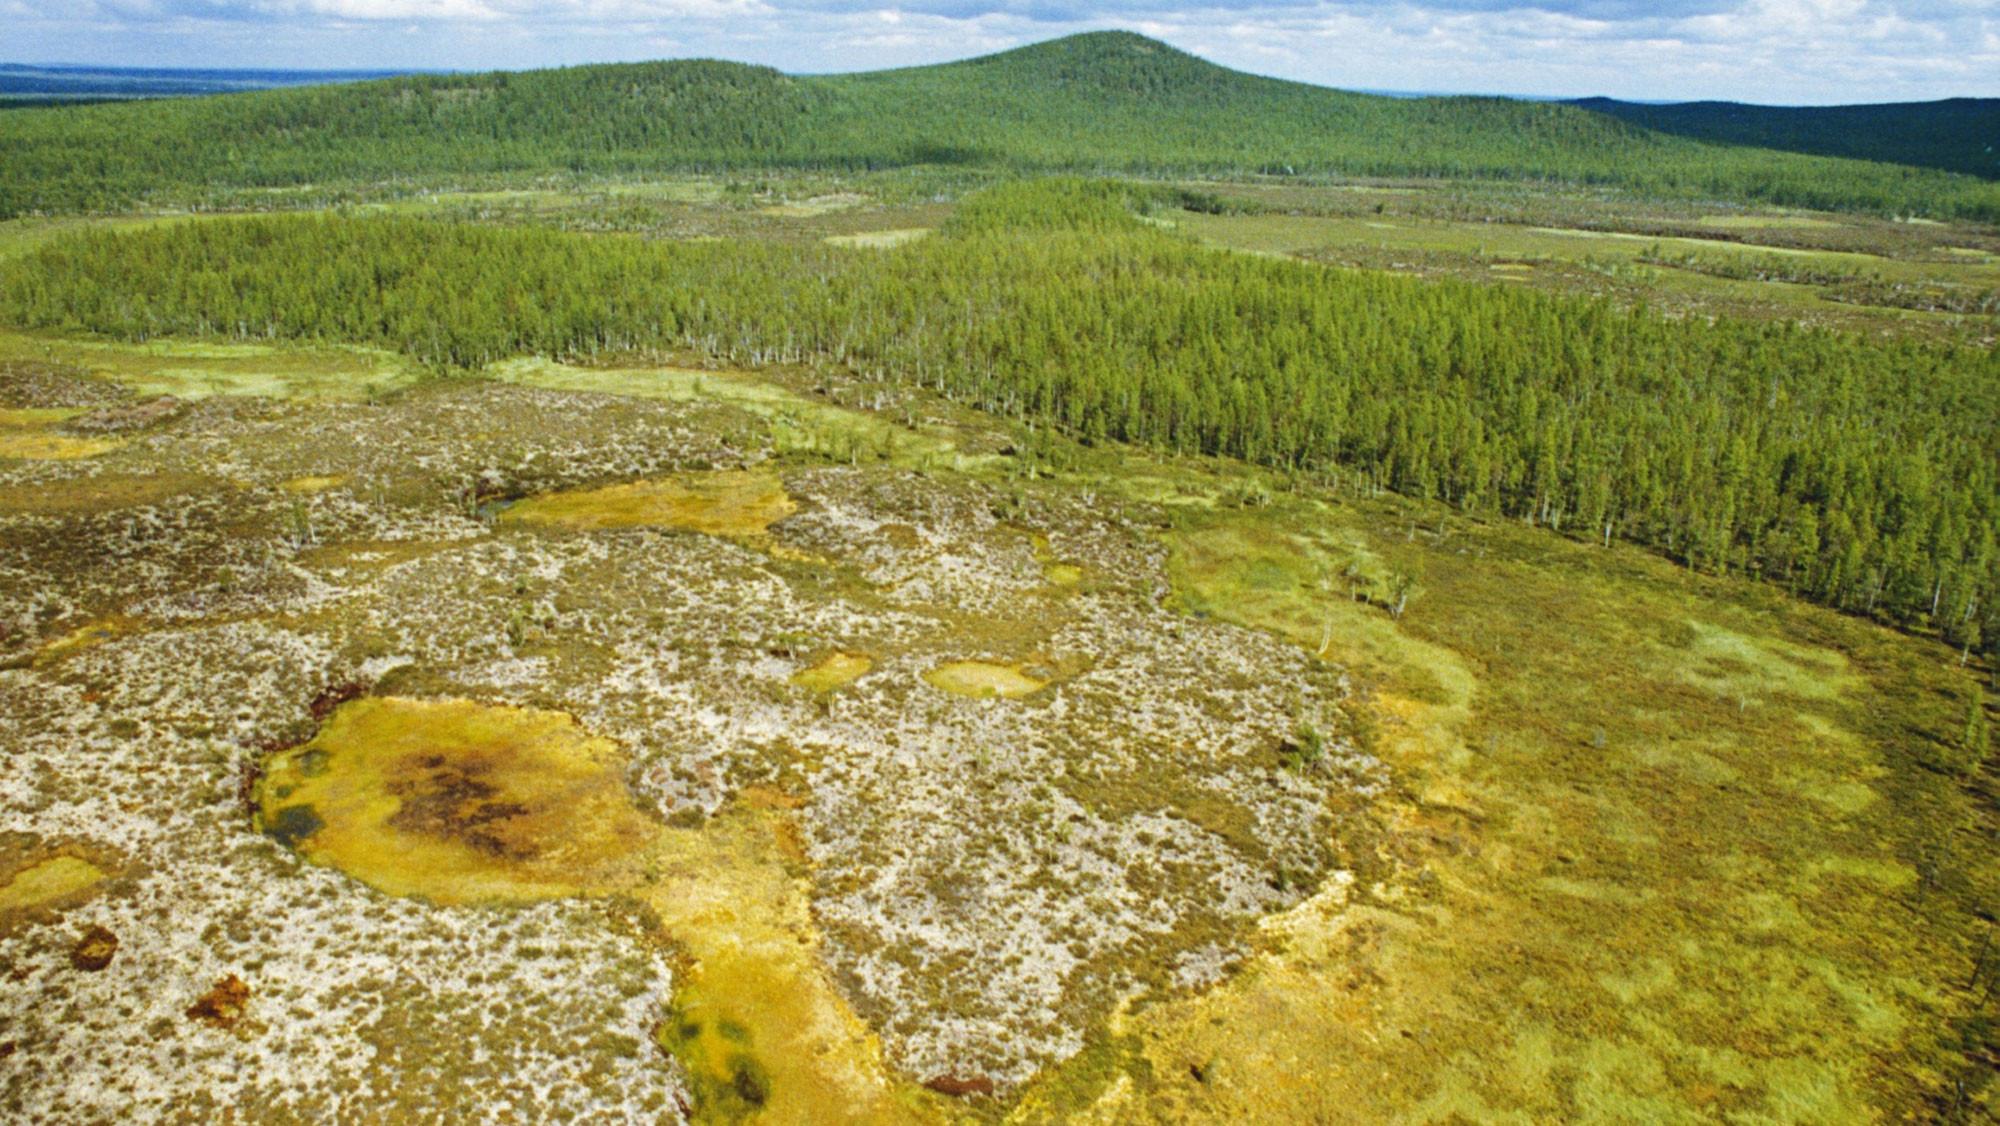 картинки метеорита тунгусский метеорит коктейльное платье